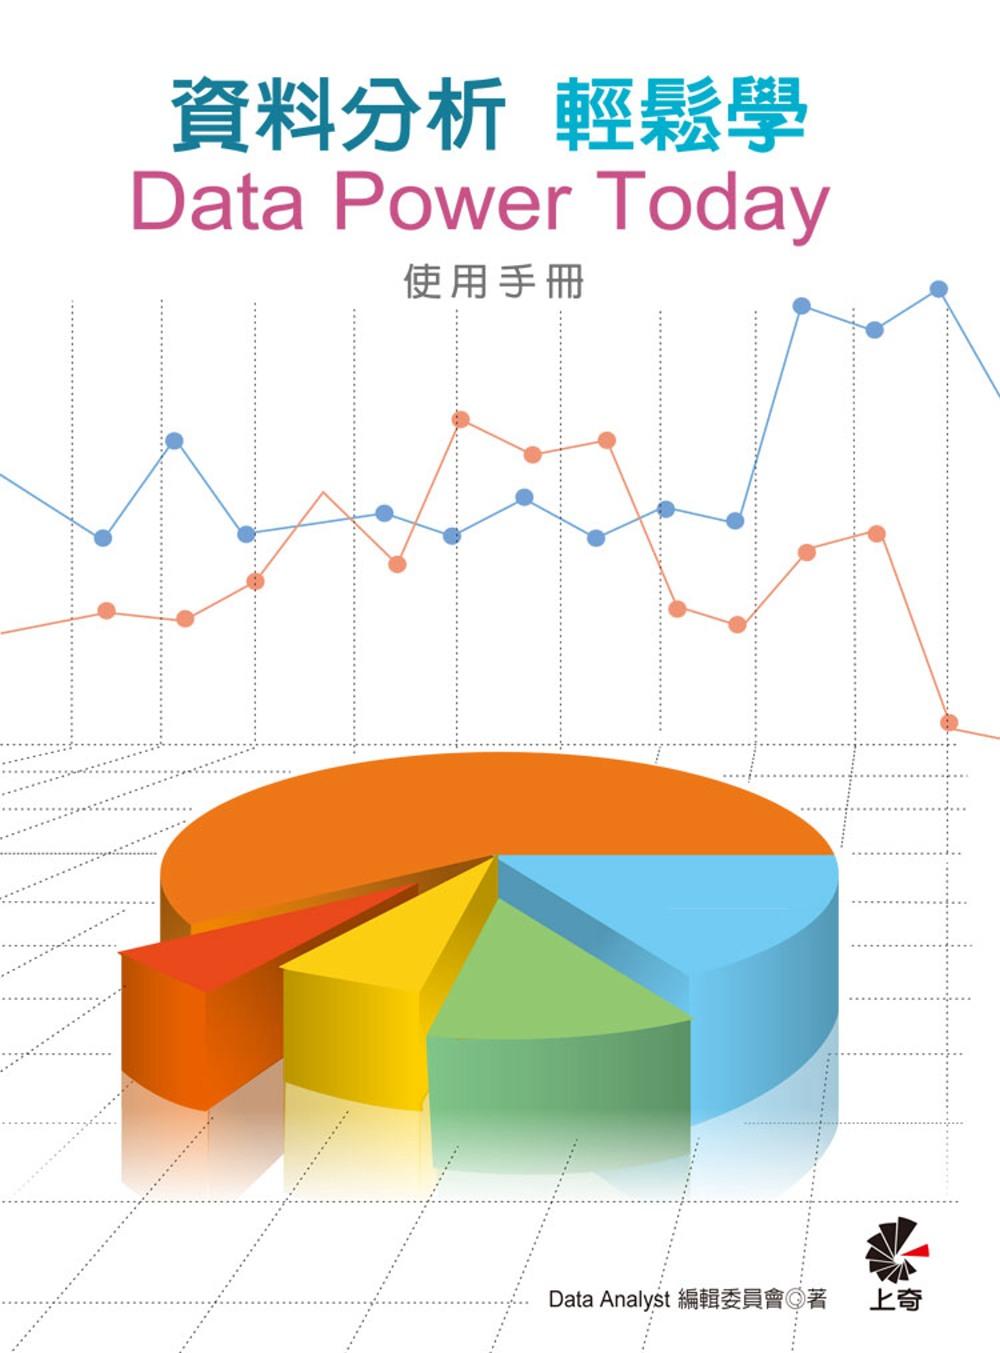 資料分析輕鬆學:Data Power Today使用手冊